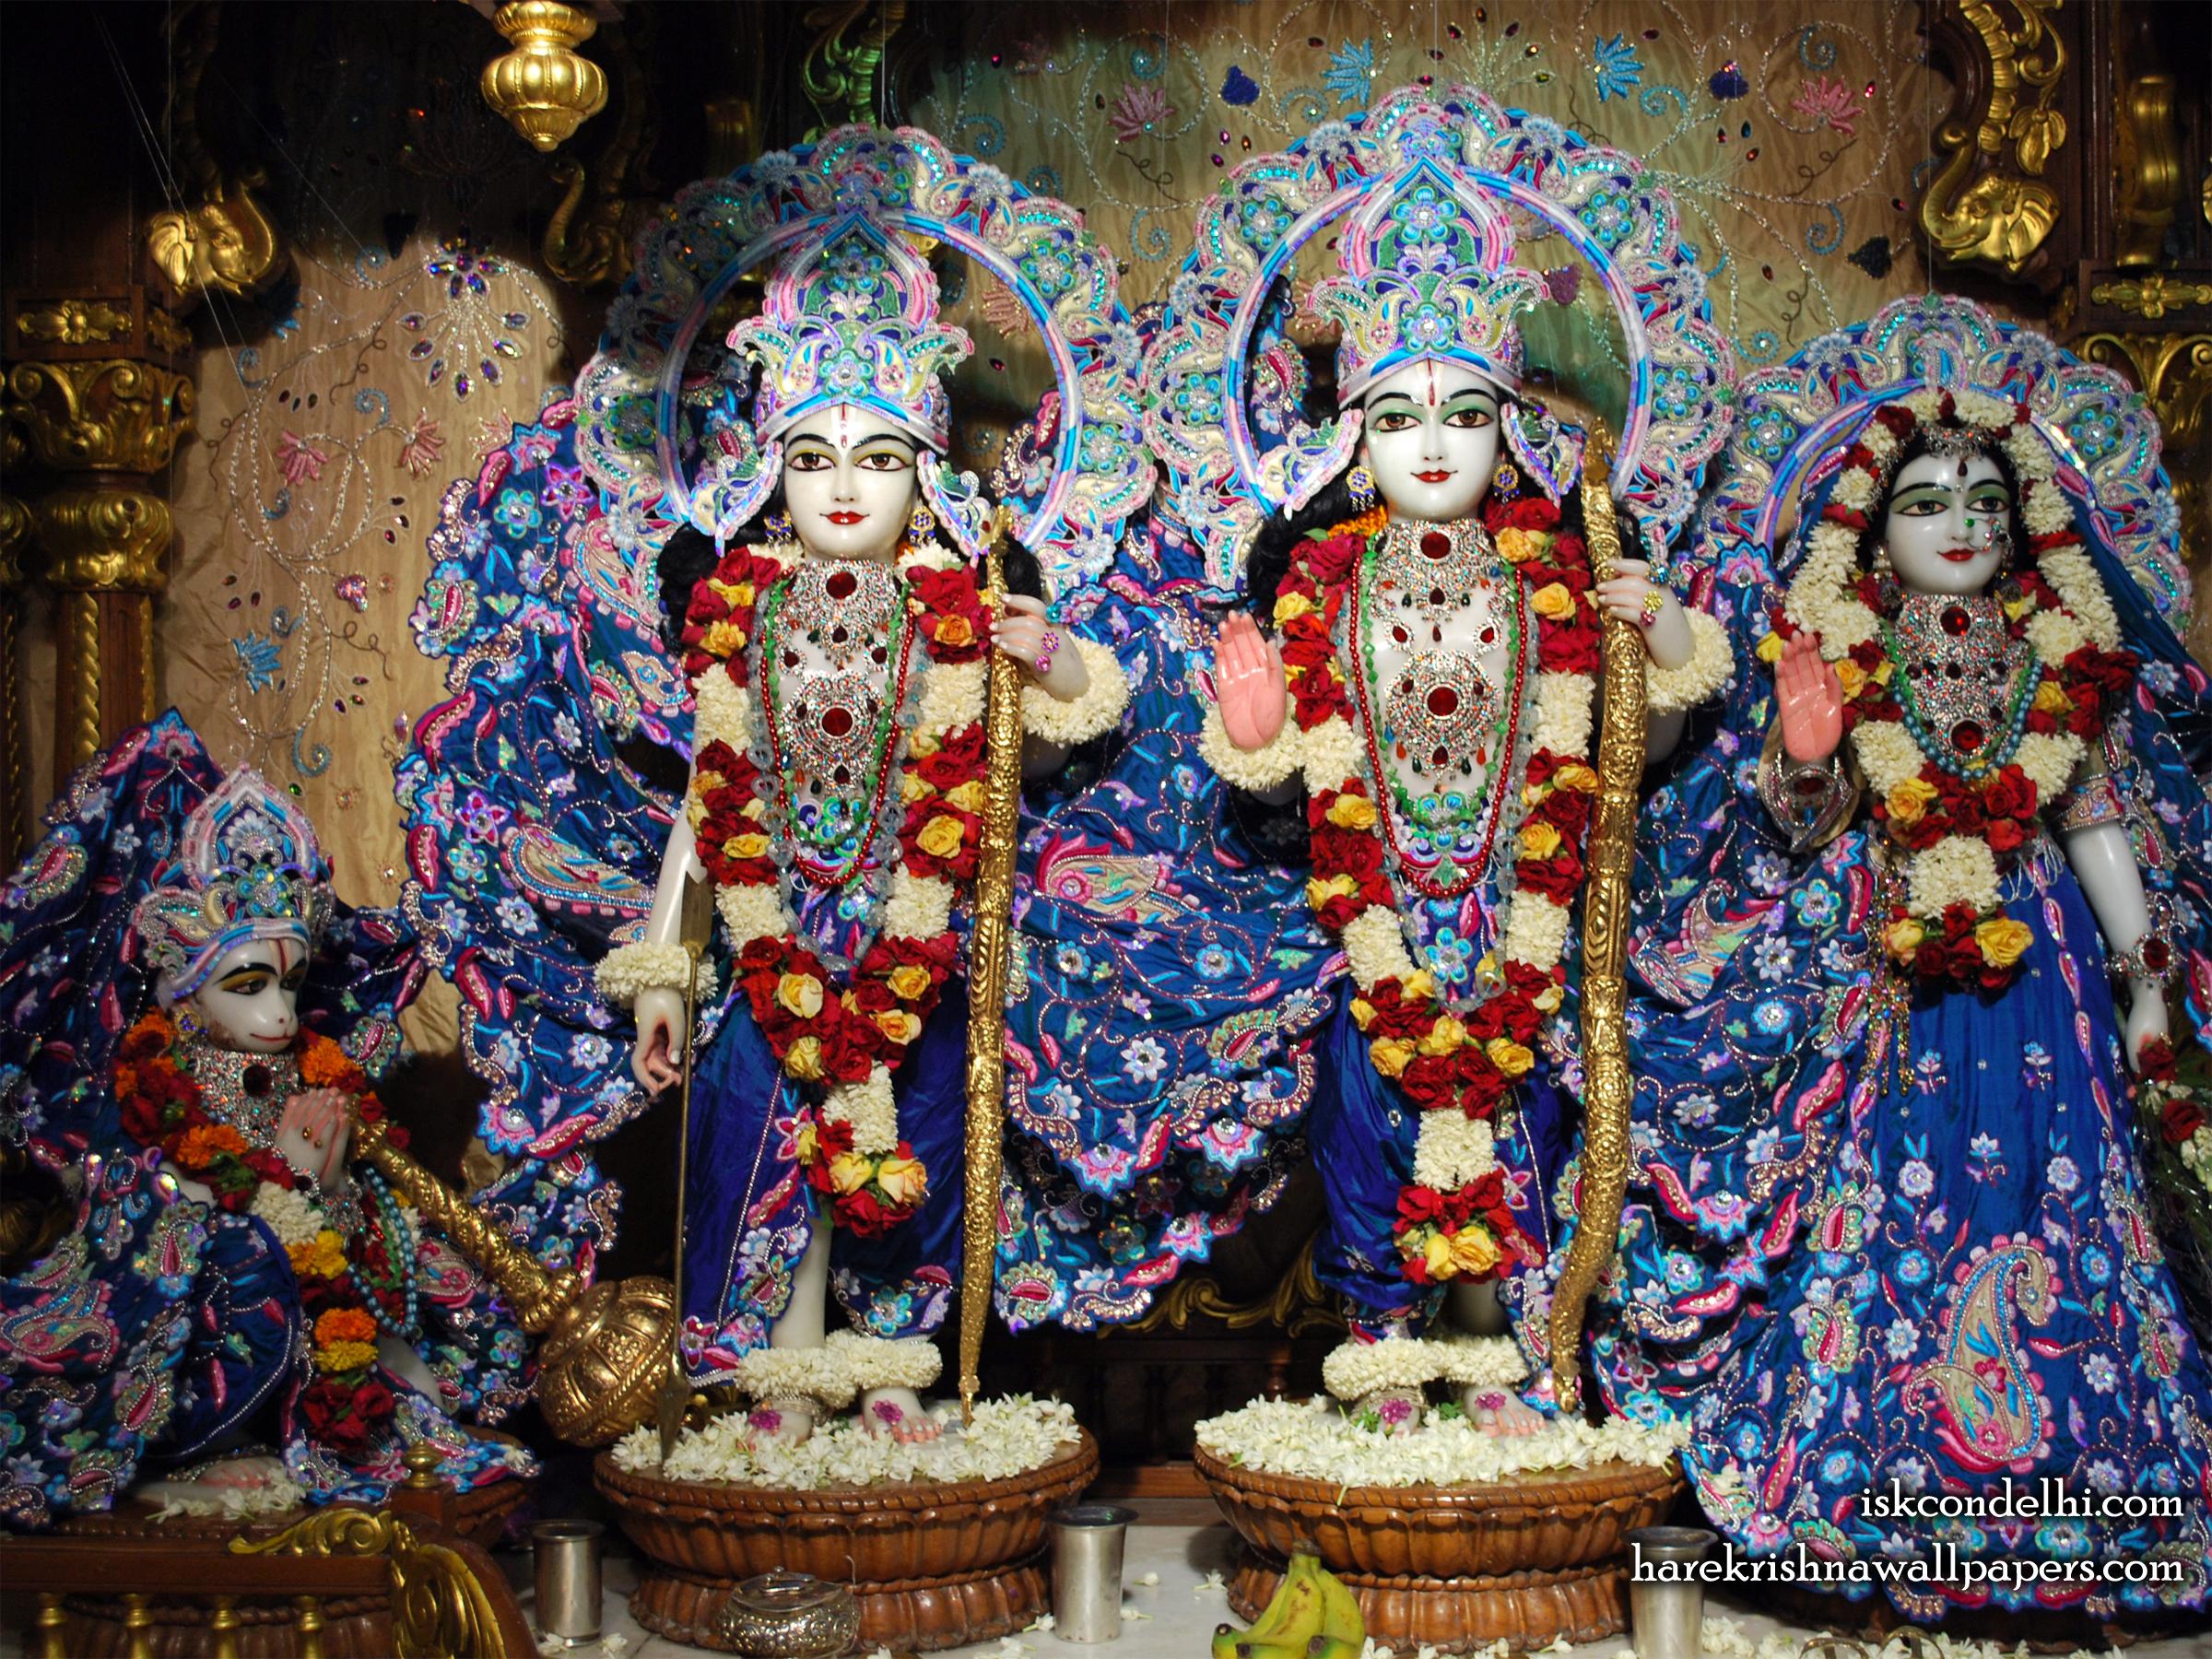 Sri Sri Sita Rama Laxman Hanuman Wallpaper (010) Size 2400x1800 Download